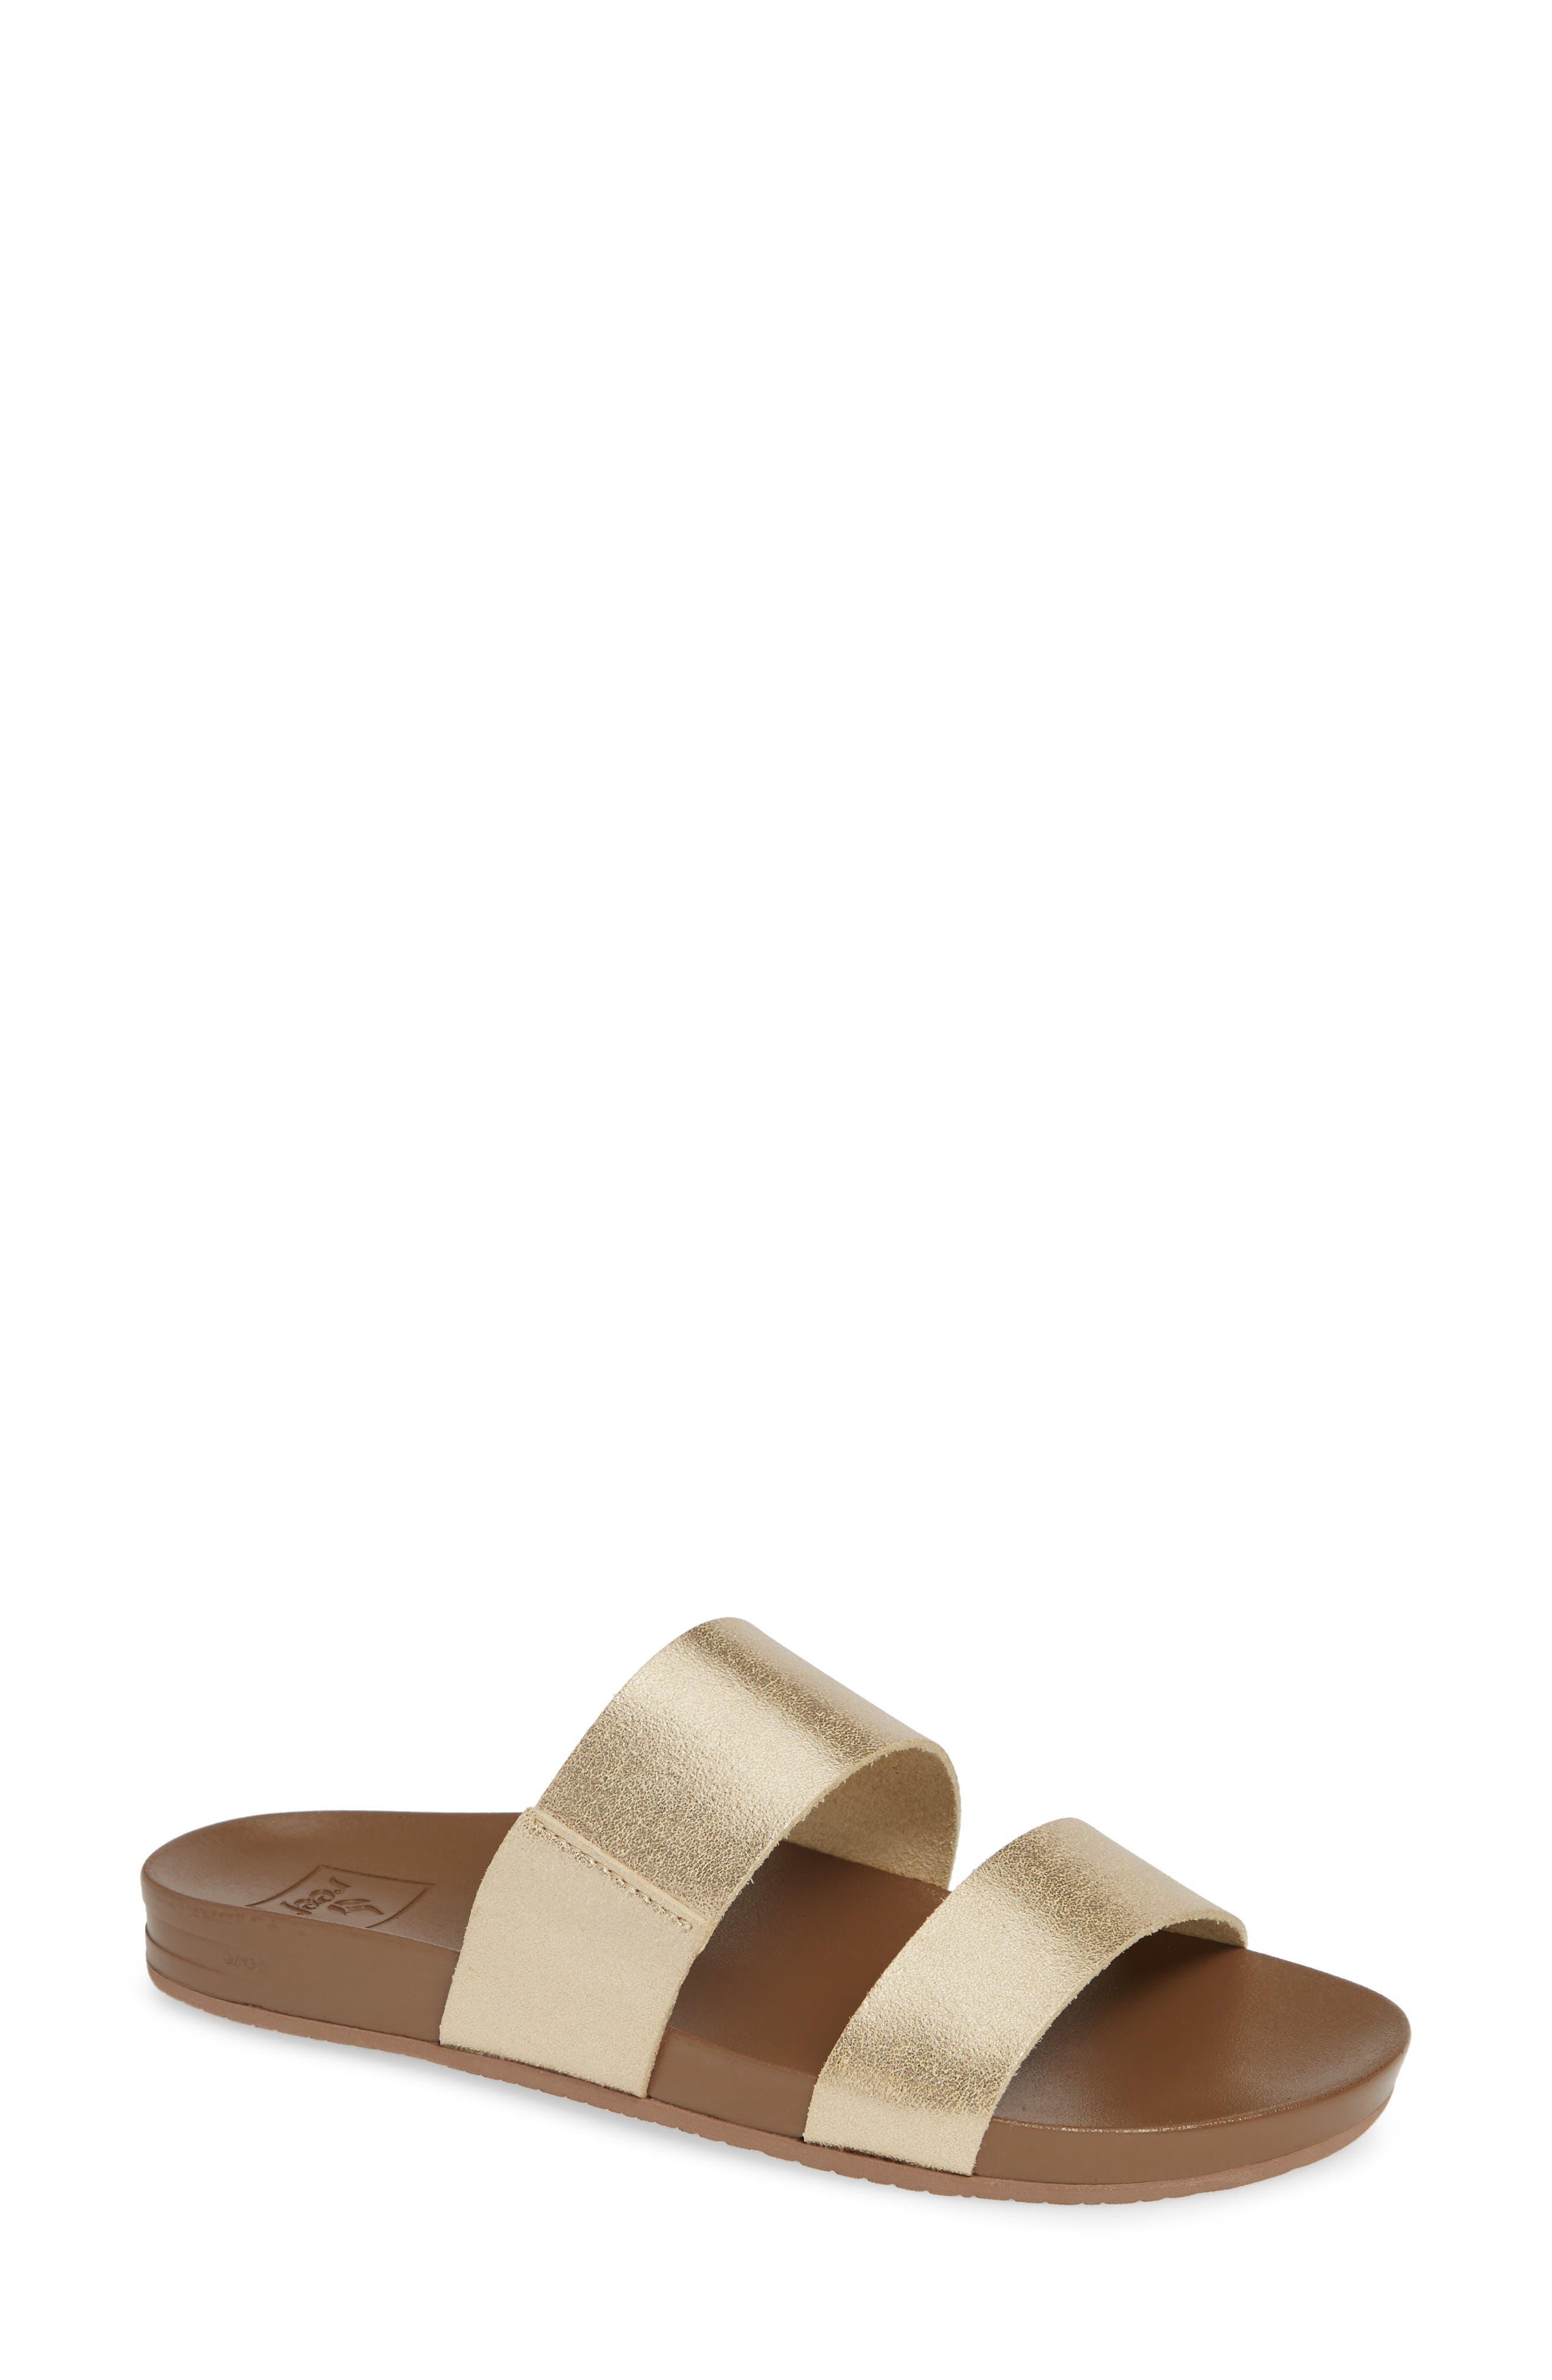 Cushion Bounce Vista Slide Sandal,                         Main,                         color, CHAMPAGNE